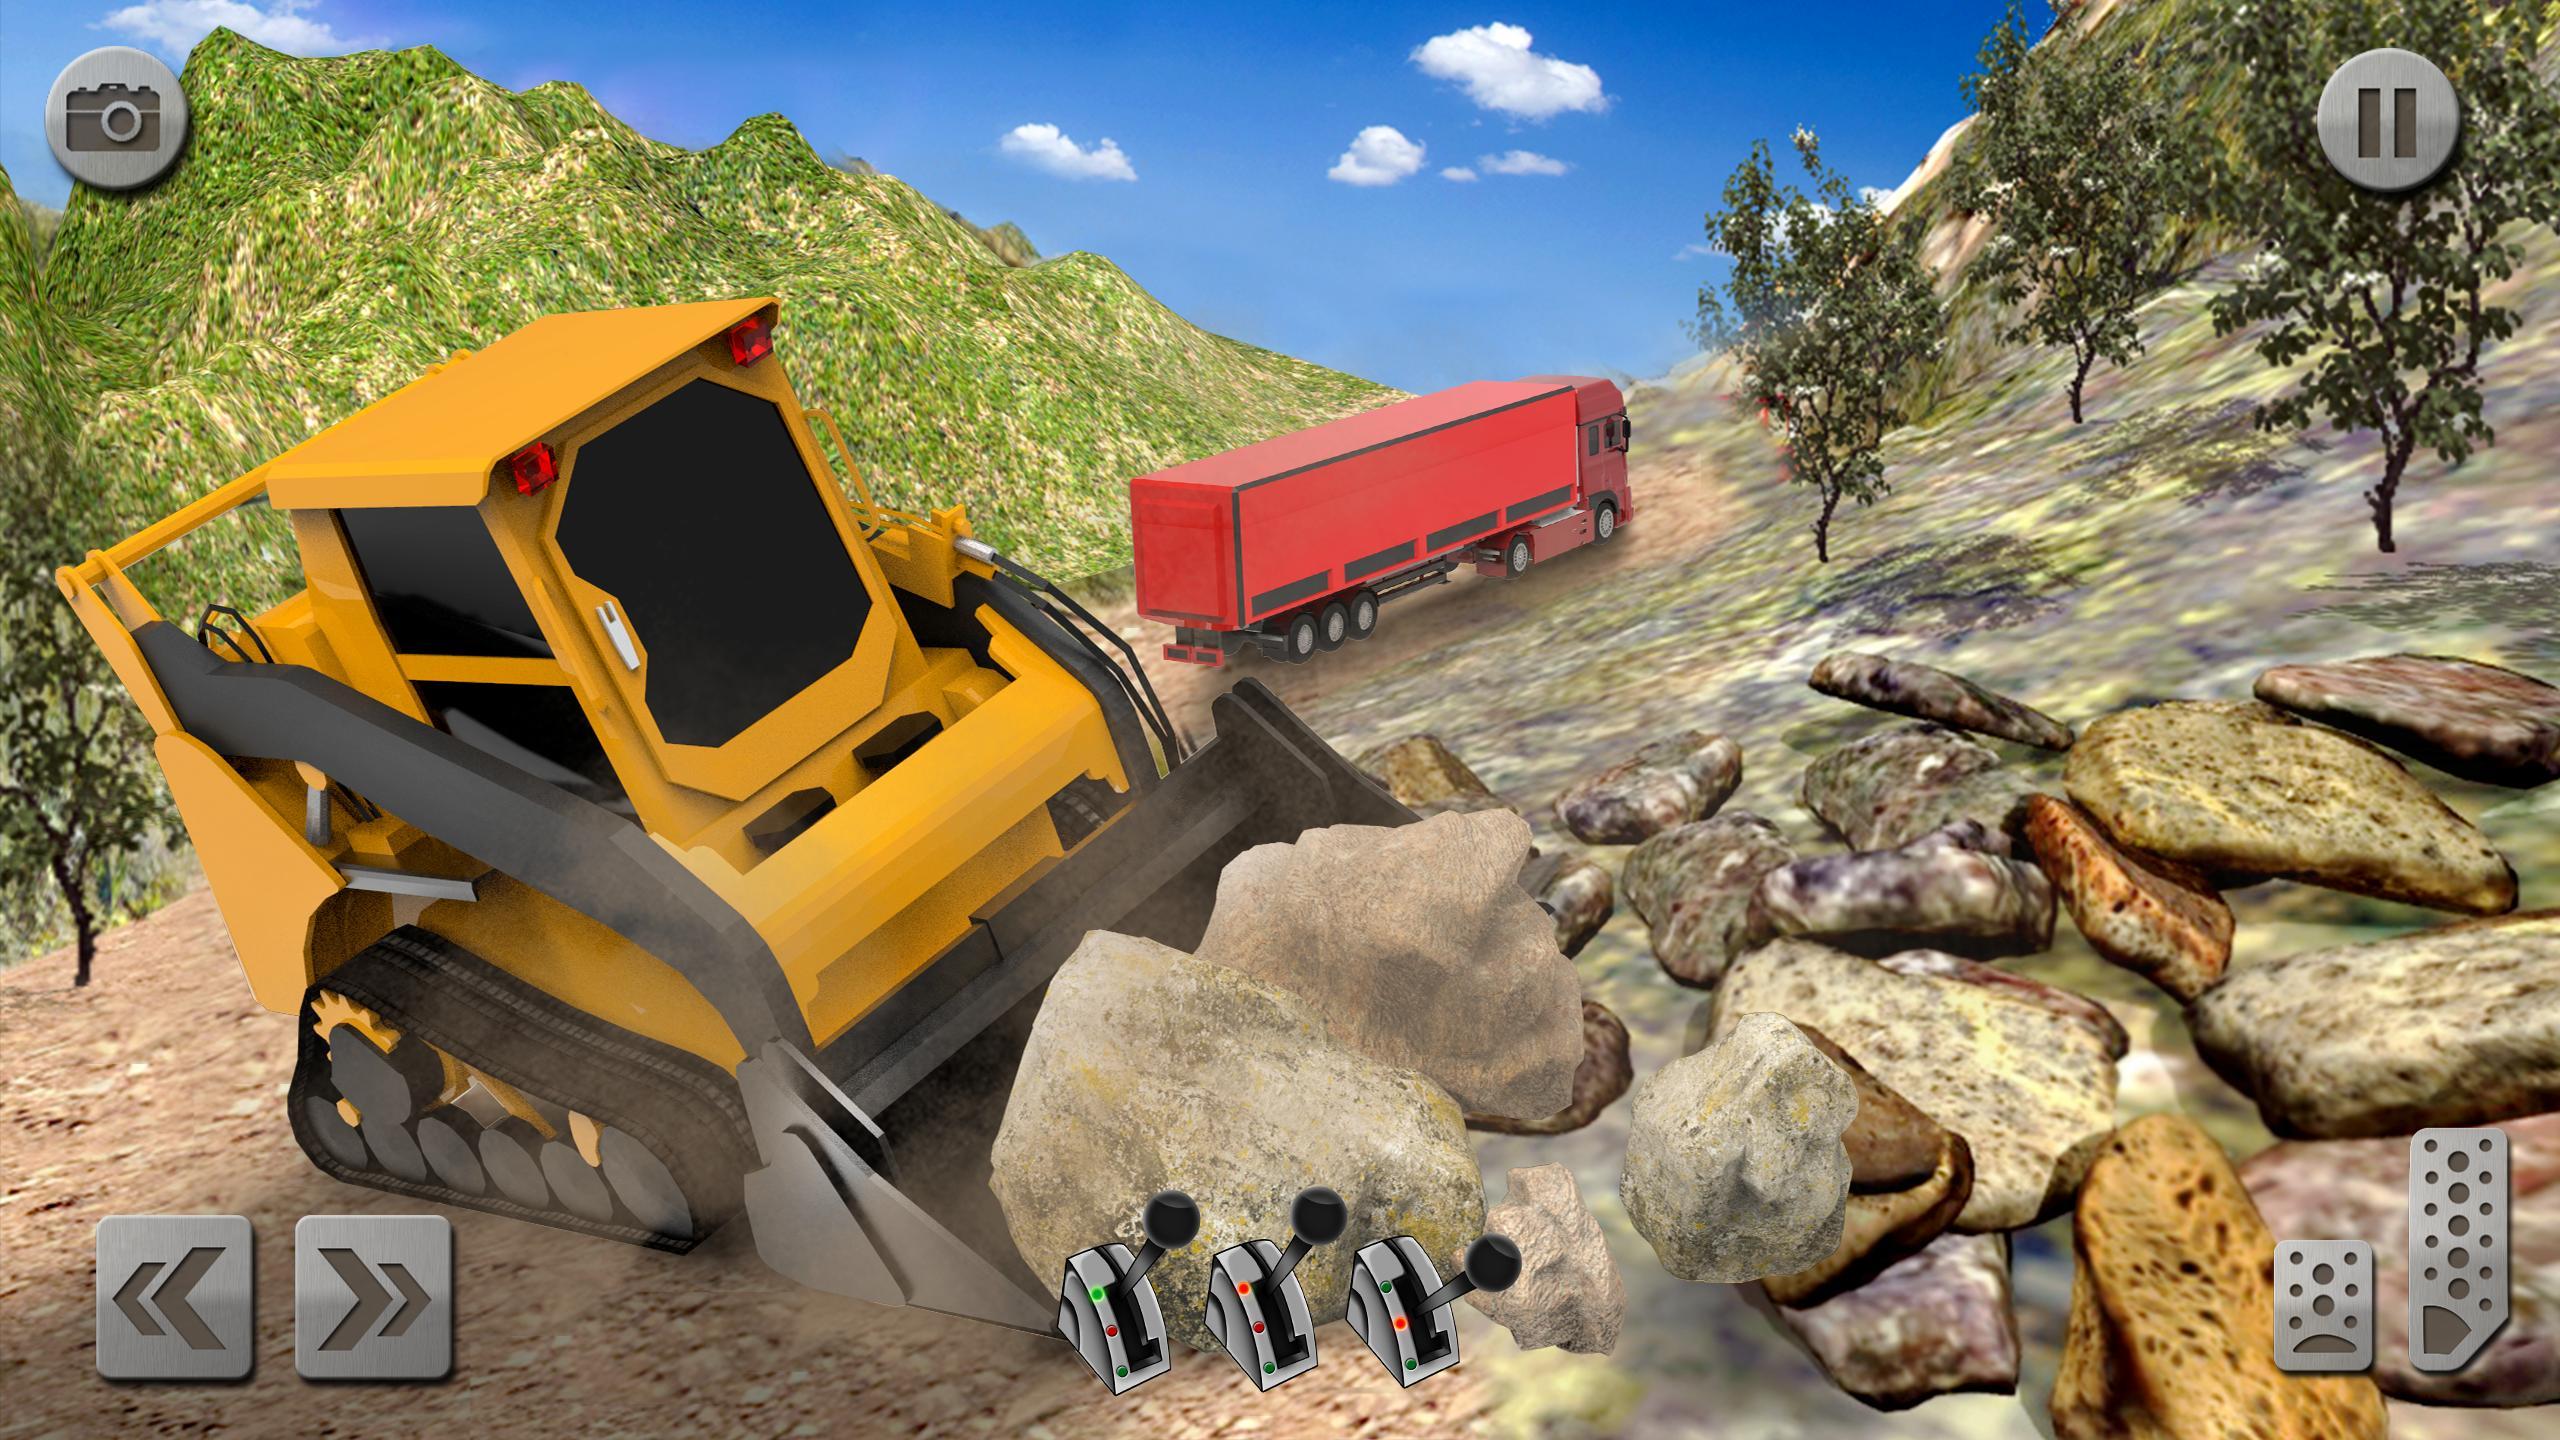 Sand Excavator Truck Driving Rescue Simulator game 5.2 Screenshot 4